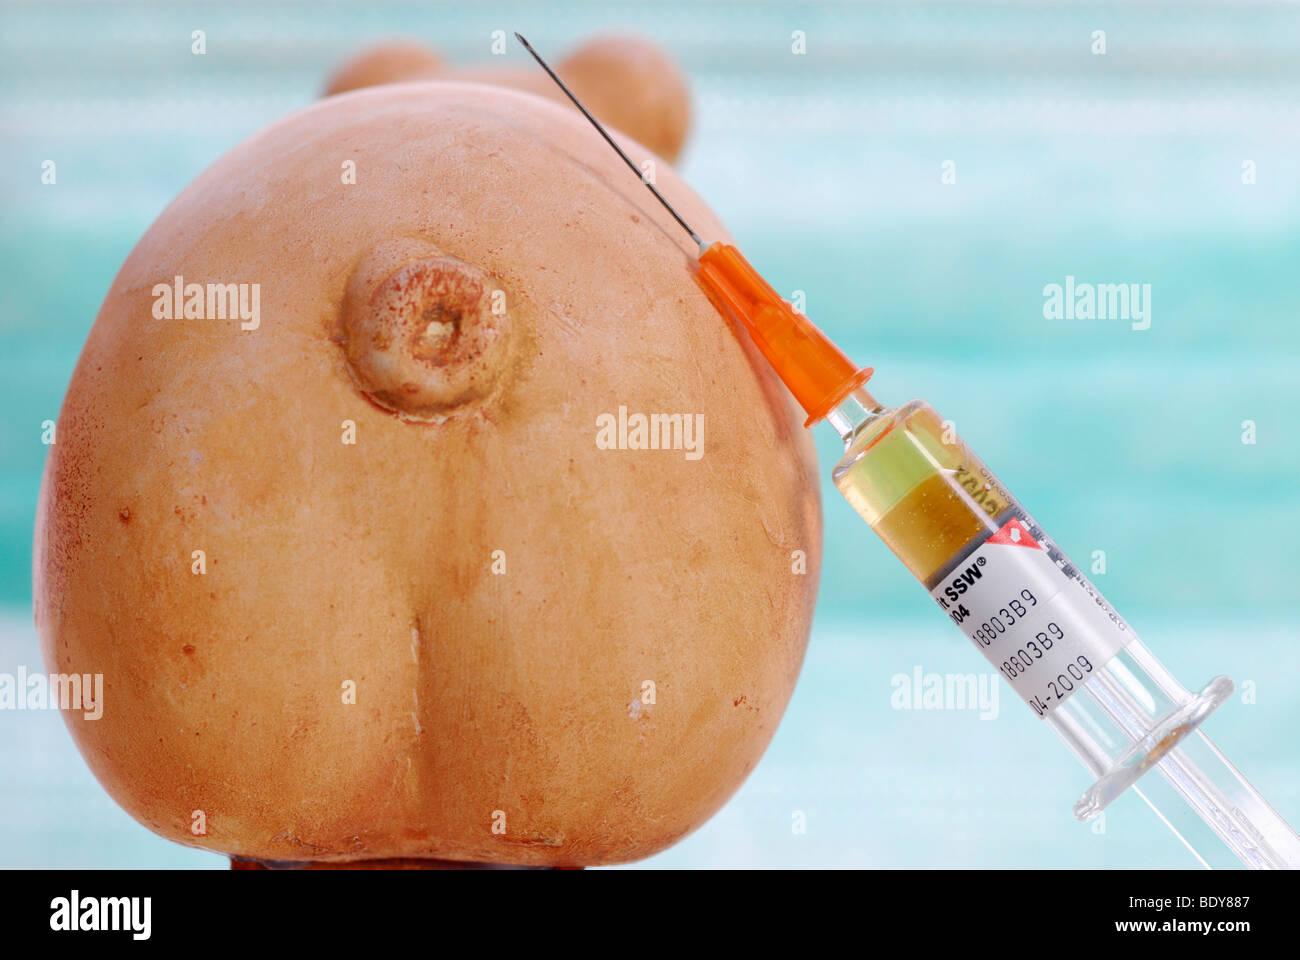 Miniature swine and syringe, vaccination against swine flu Stock Photo